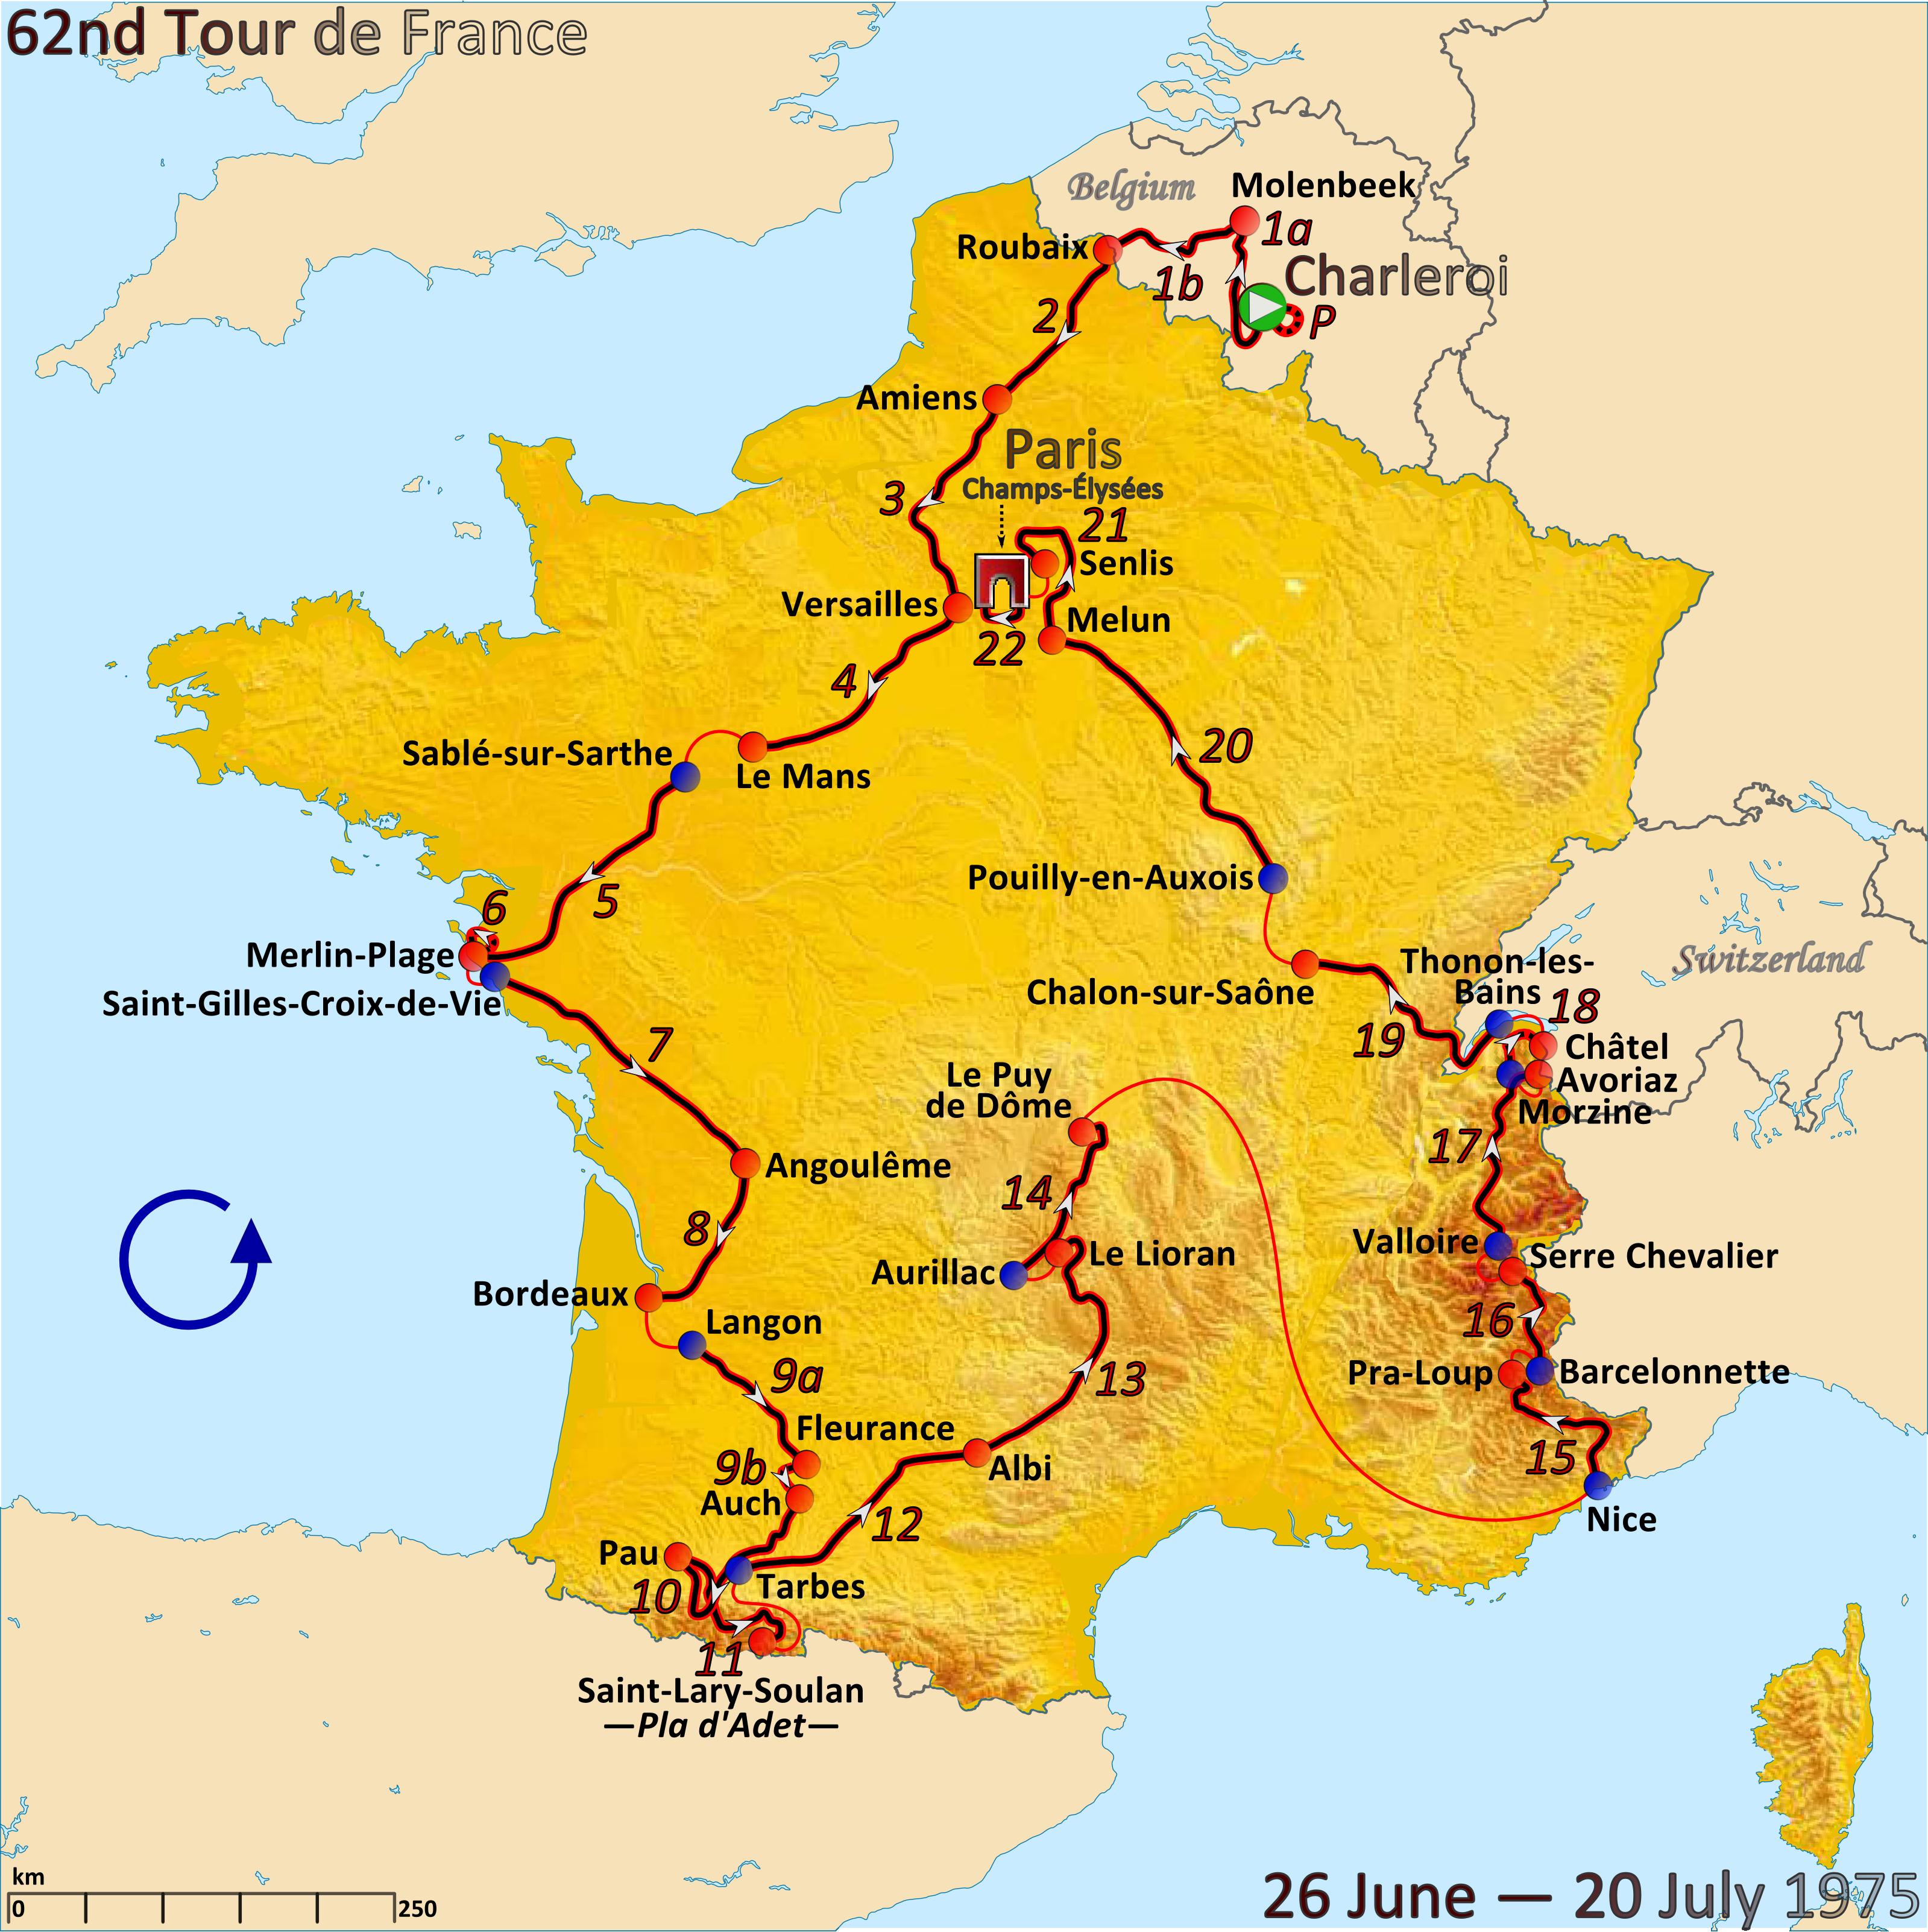 1975 tour de france - wikipedia